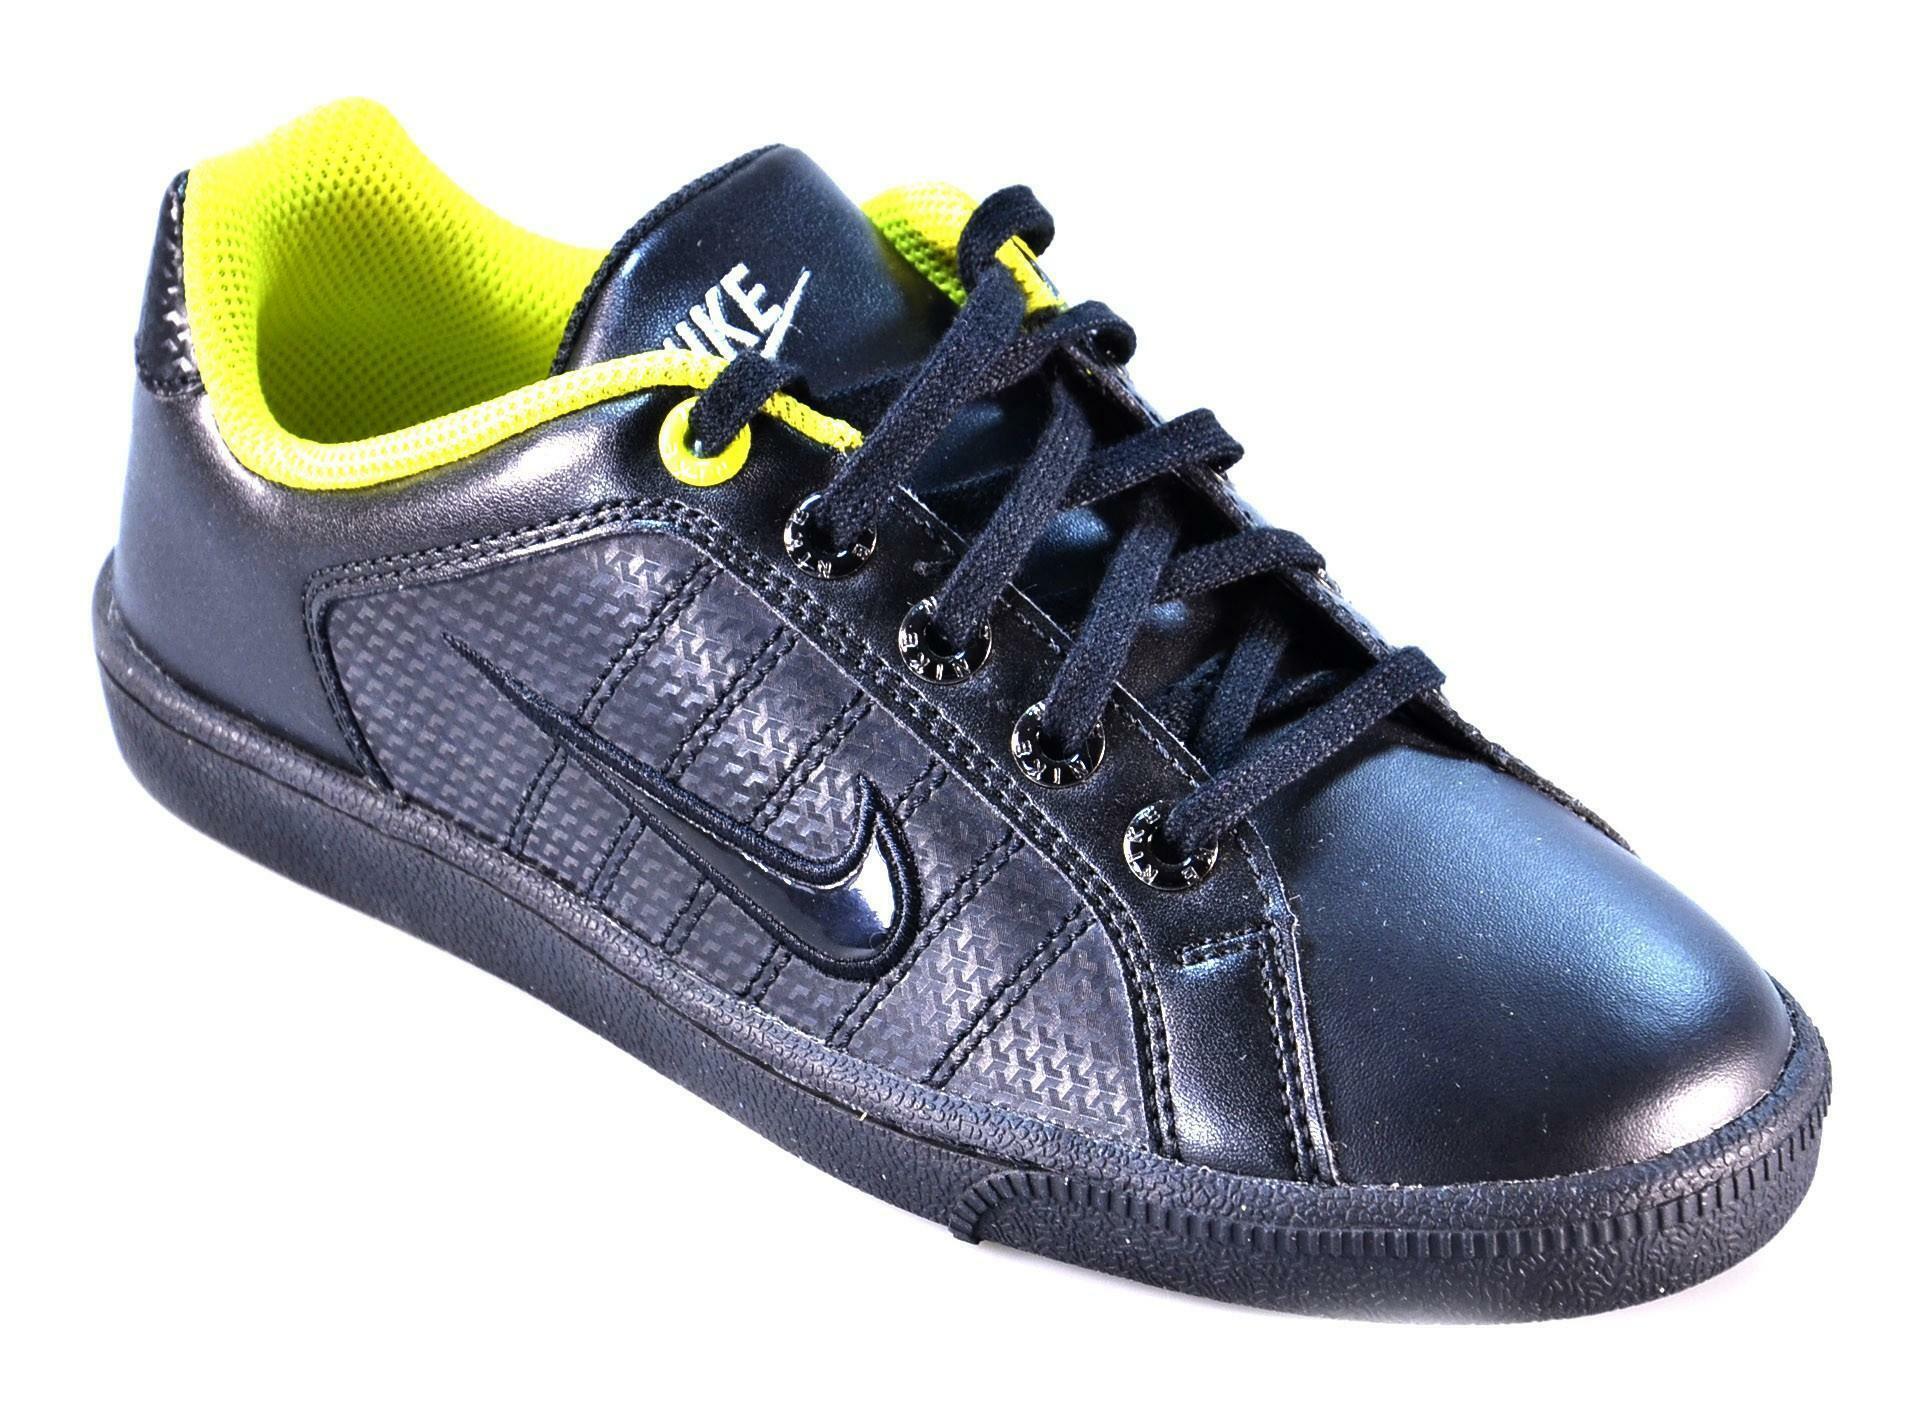 nike nike court tradition 2 plus scarpe bambino nere 407930